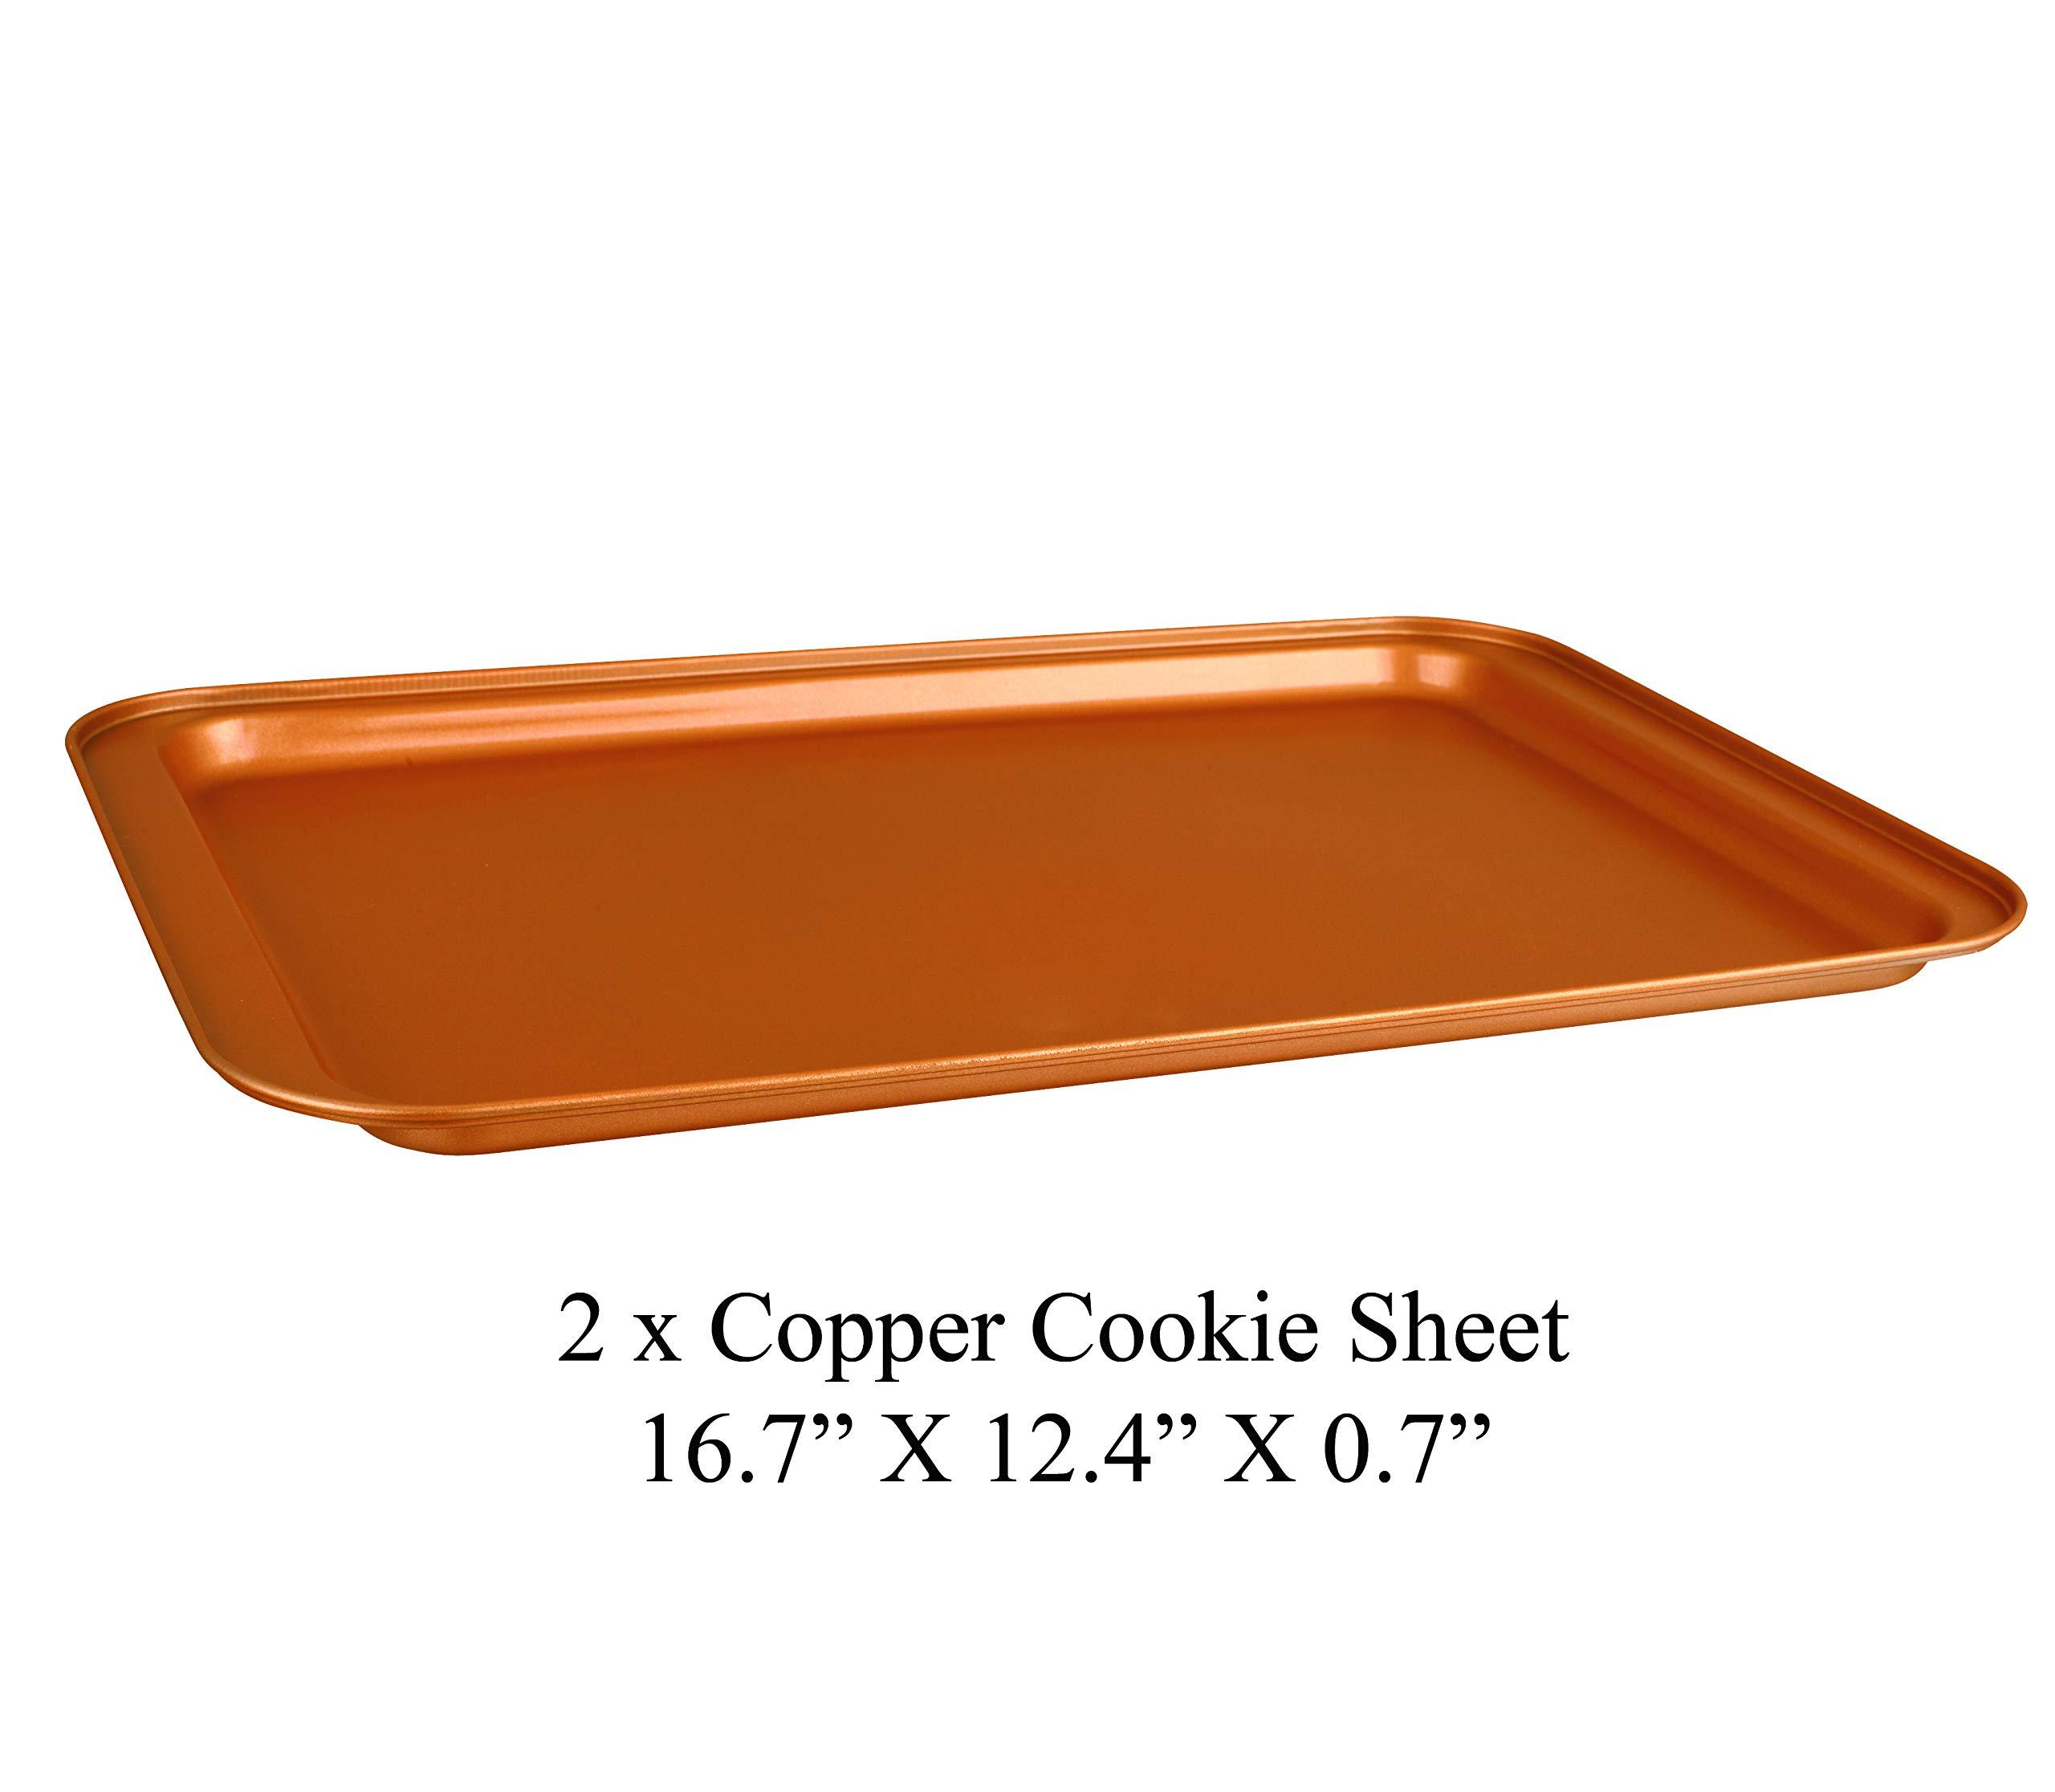 CopperKitchen Baking Pans - 3 pcs Toxic Free NONSTICK - Organic Environmental Friendly Premium Coating - Durable Quality - Rectangle Pan, Cookie Sheet - BAKEWARE SET (3) by CopperKitchenUSA (Image #6)